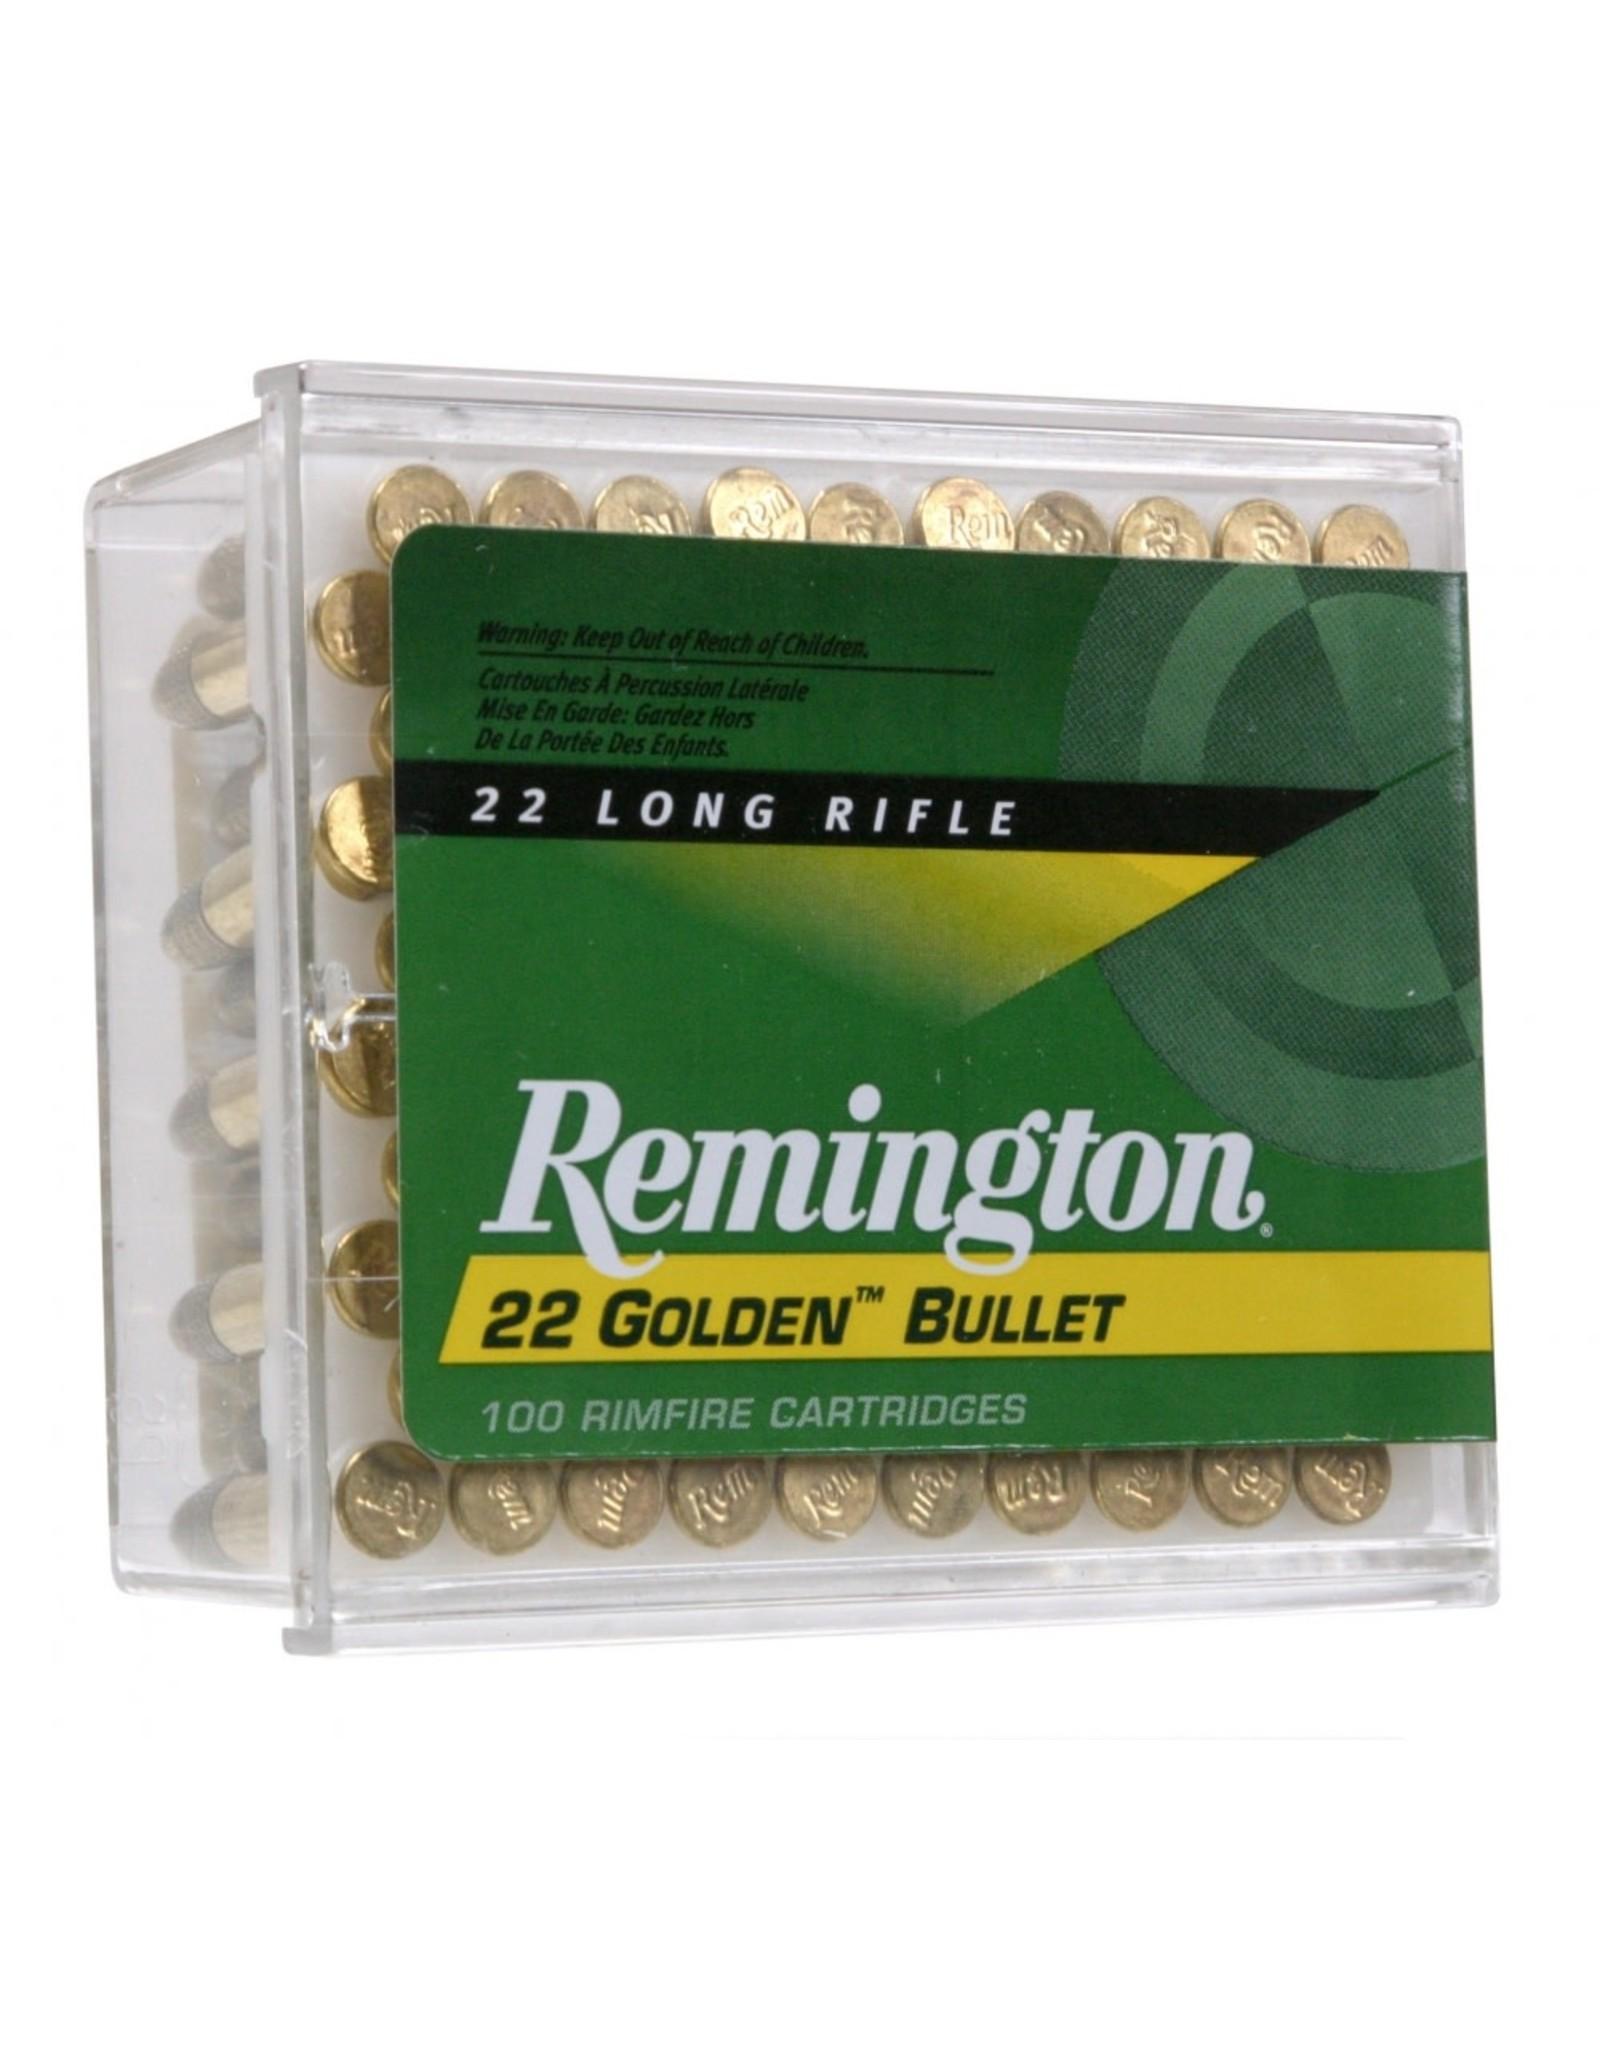 Remington Remington Golden Bullet 22LR 40gr High Velocity Plated Round Nose 100ct